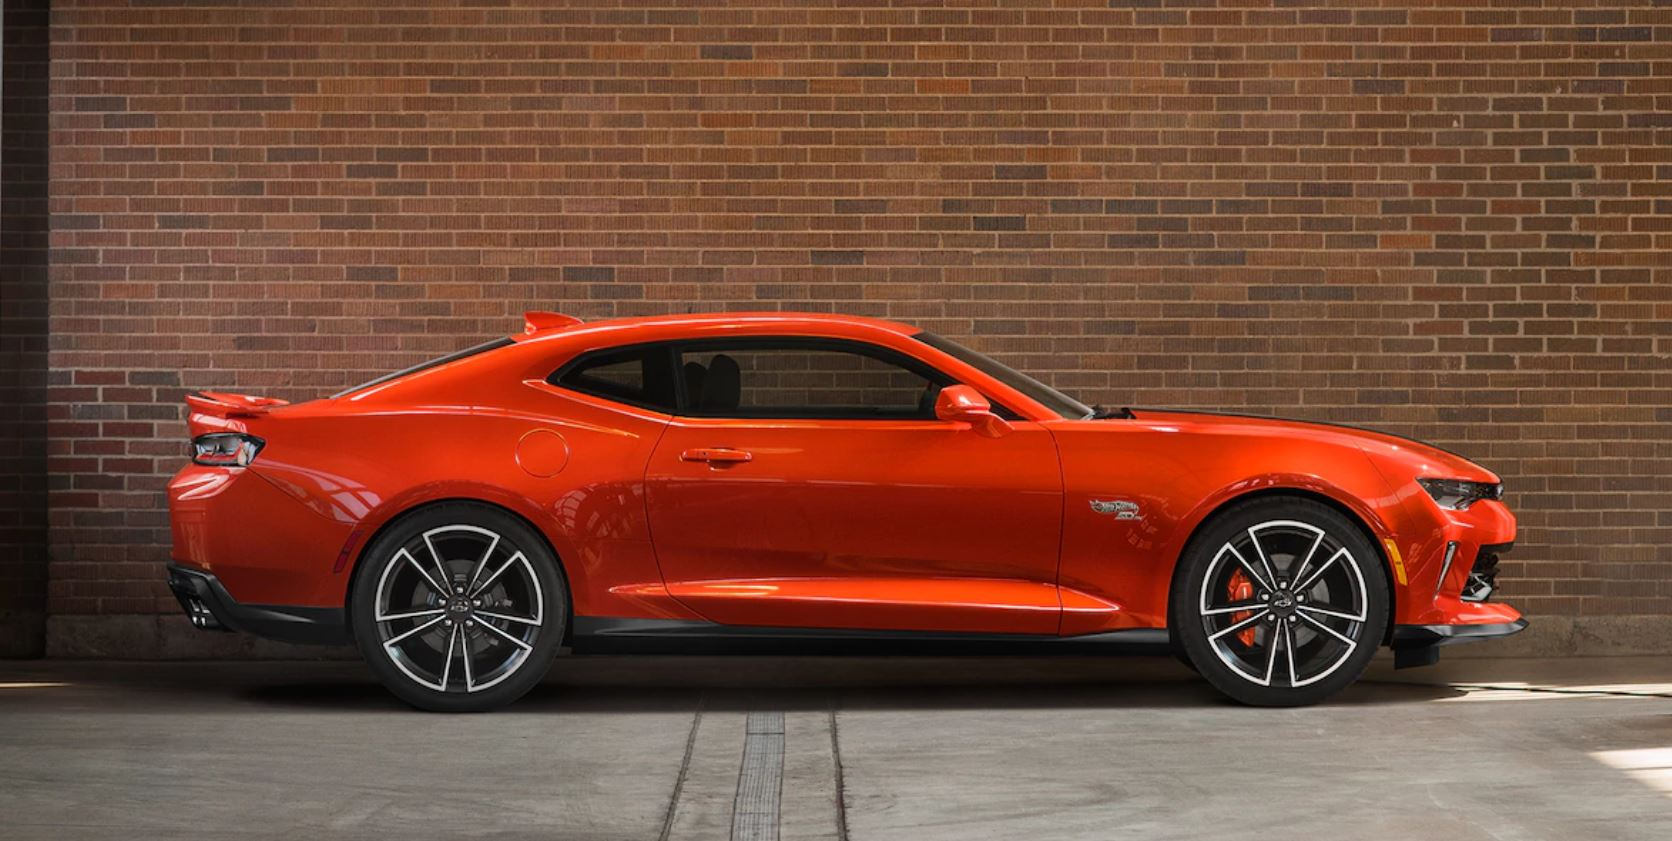 2017 SEMA Chevrolet Hot Wheels Camaro profile